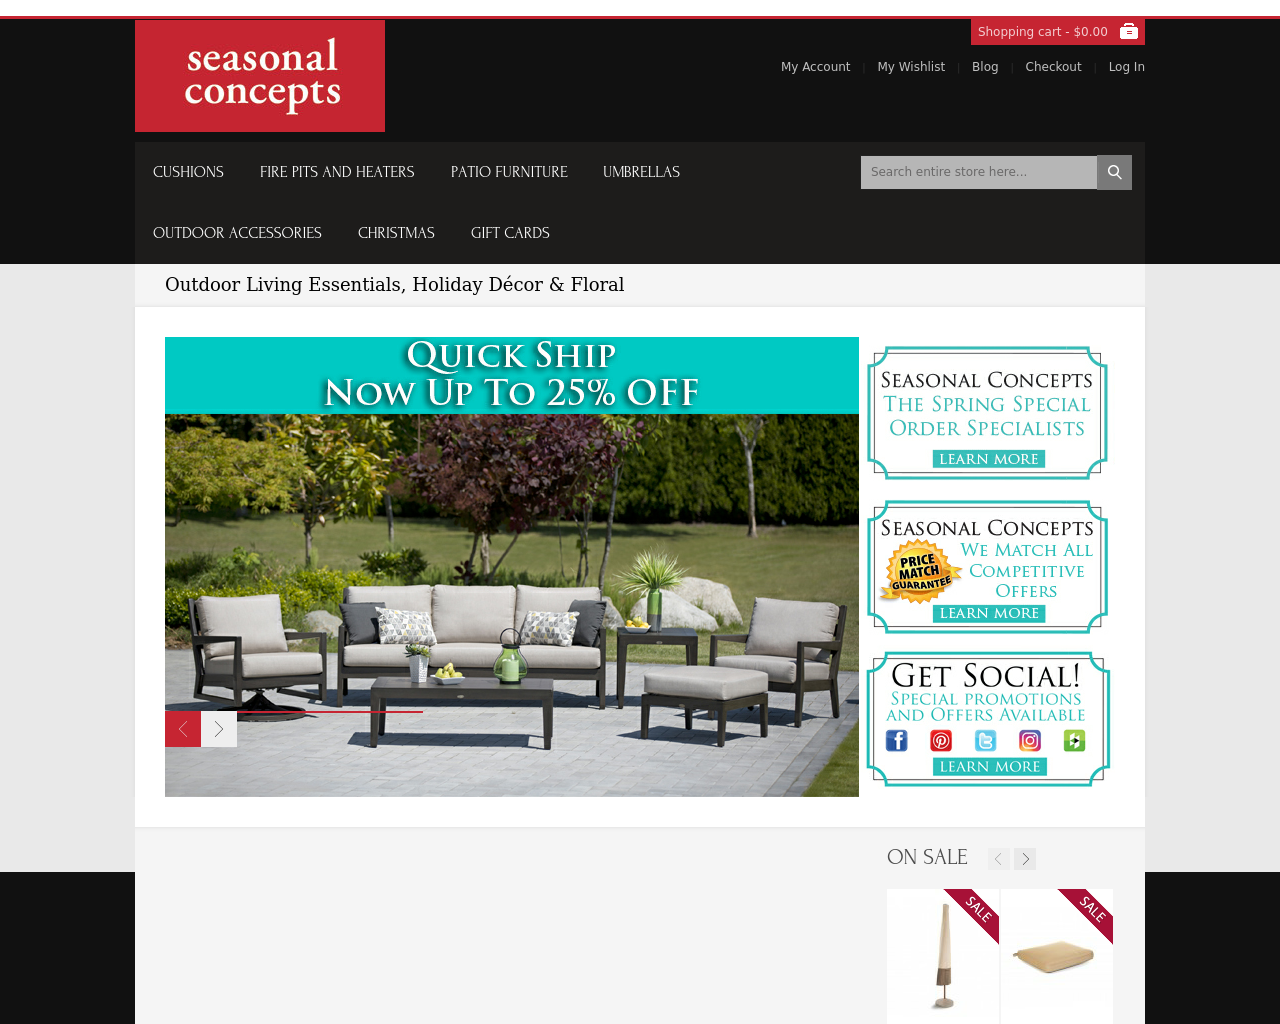 Home-Seasonal-Concepts-Advertising-Reviews-Pricing